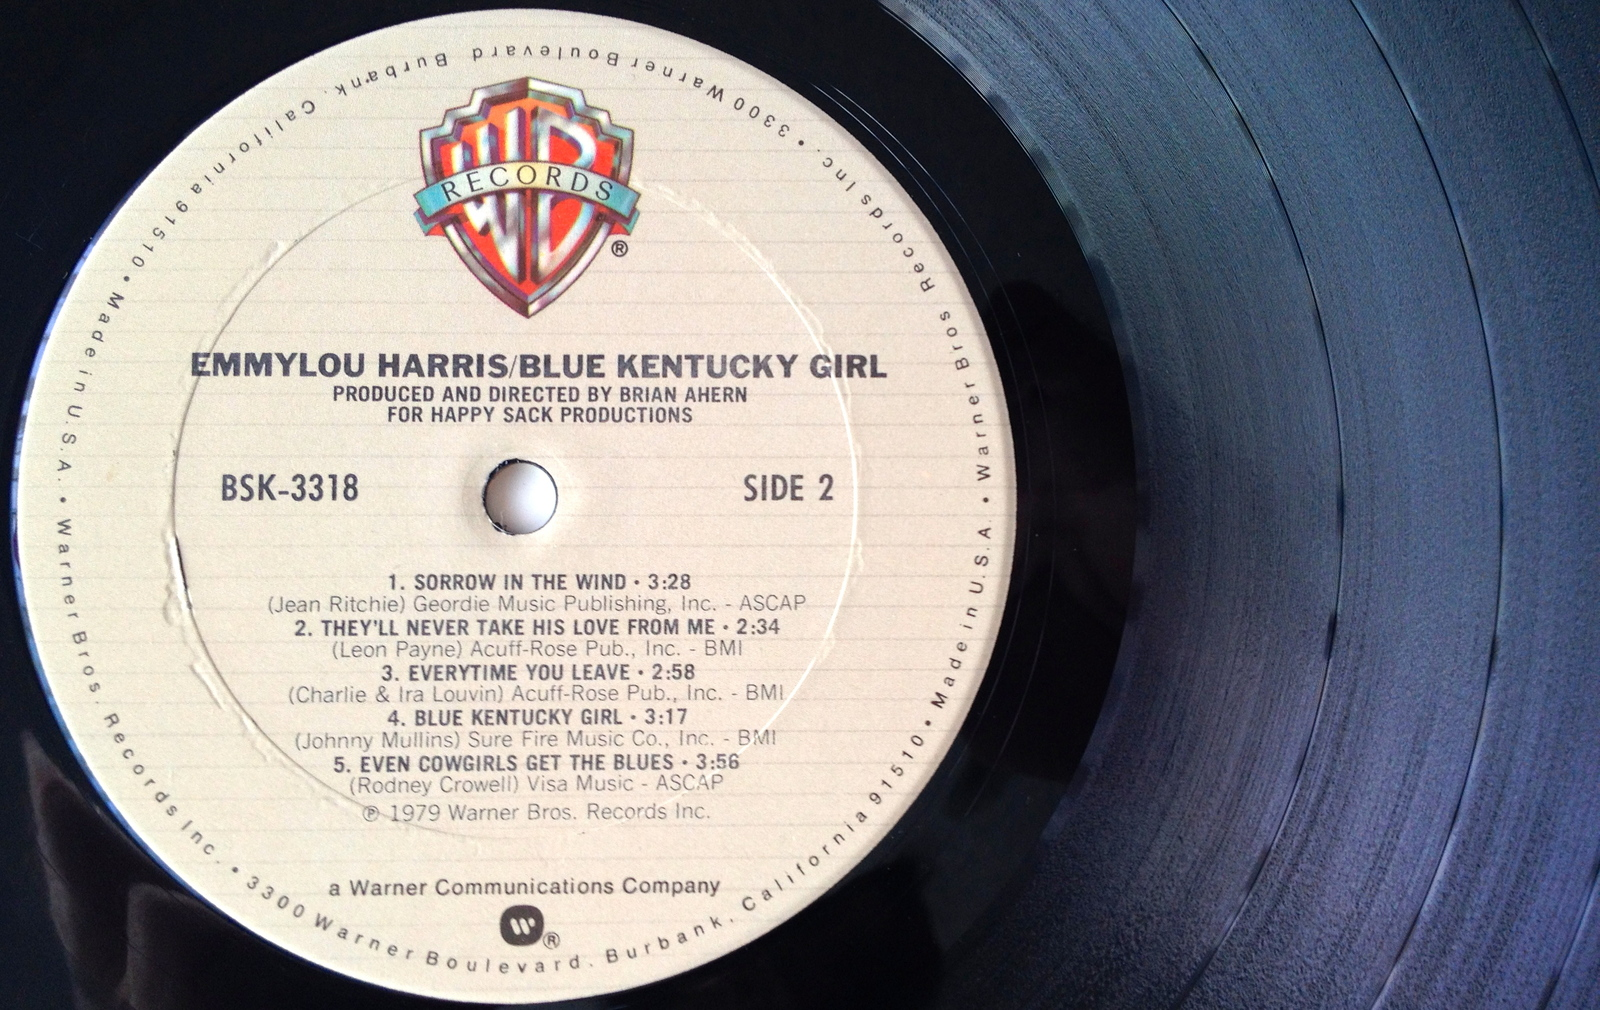 Emmylou Harris - Blue Kentucky Girl LP Vinyl Record Album, 1979